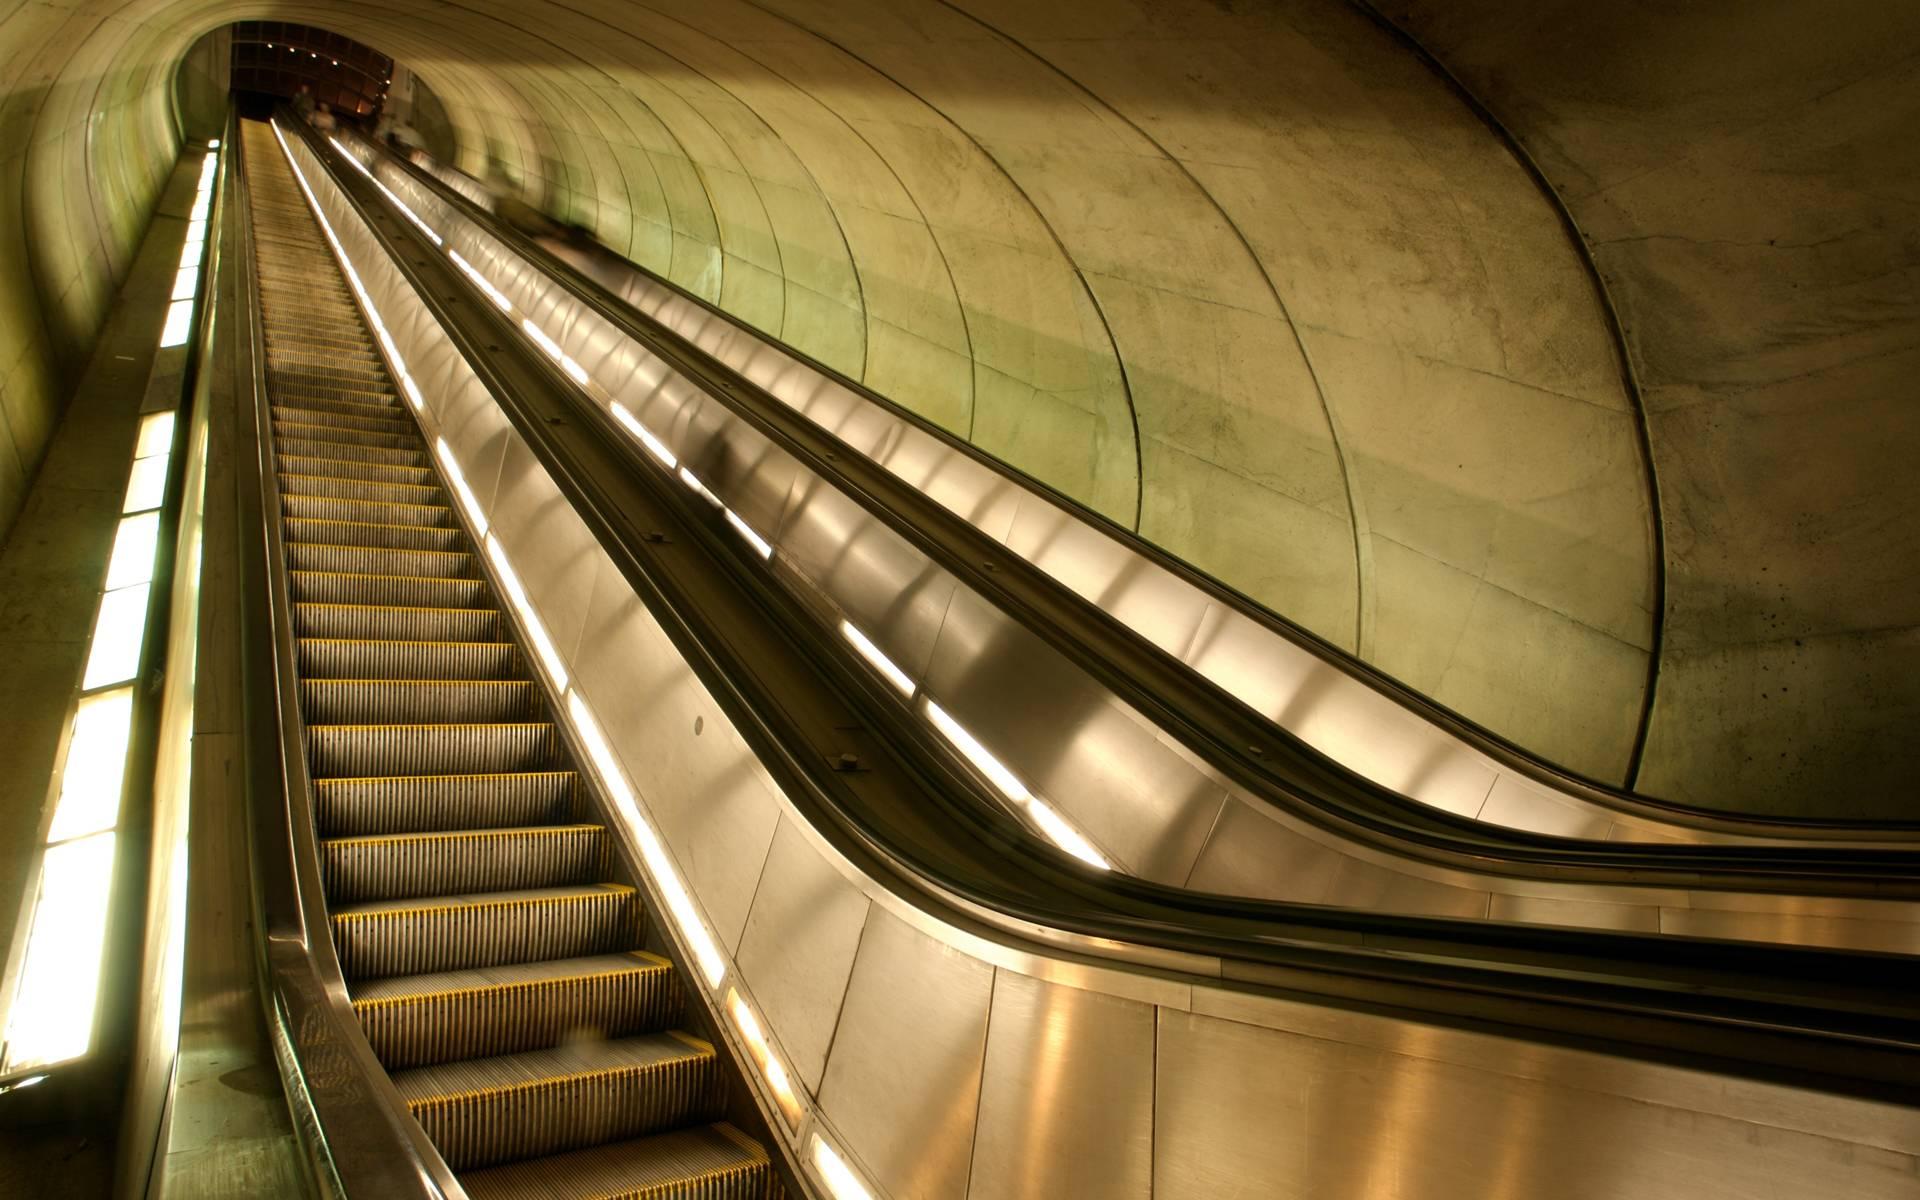 tunnel escalator desktop wallpaper 49174